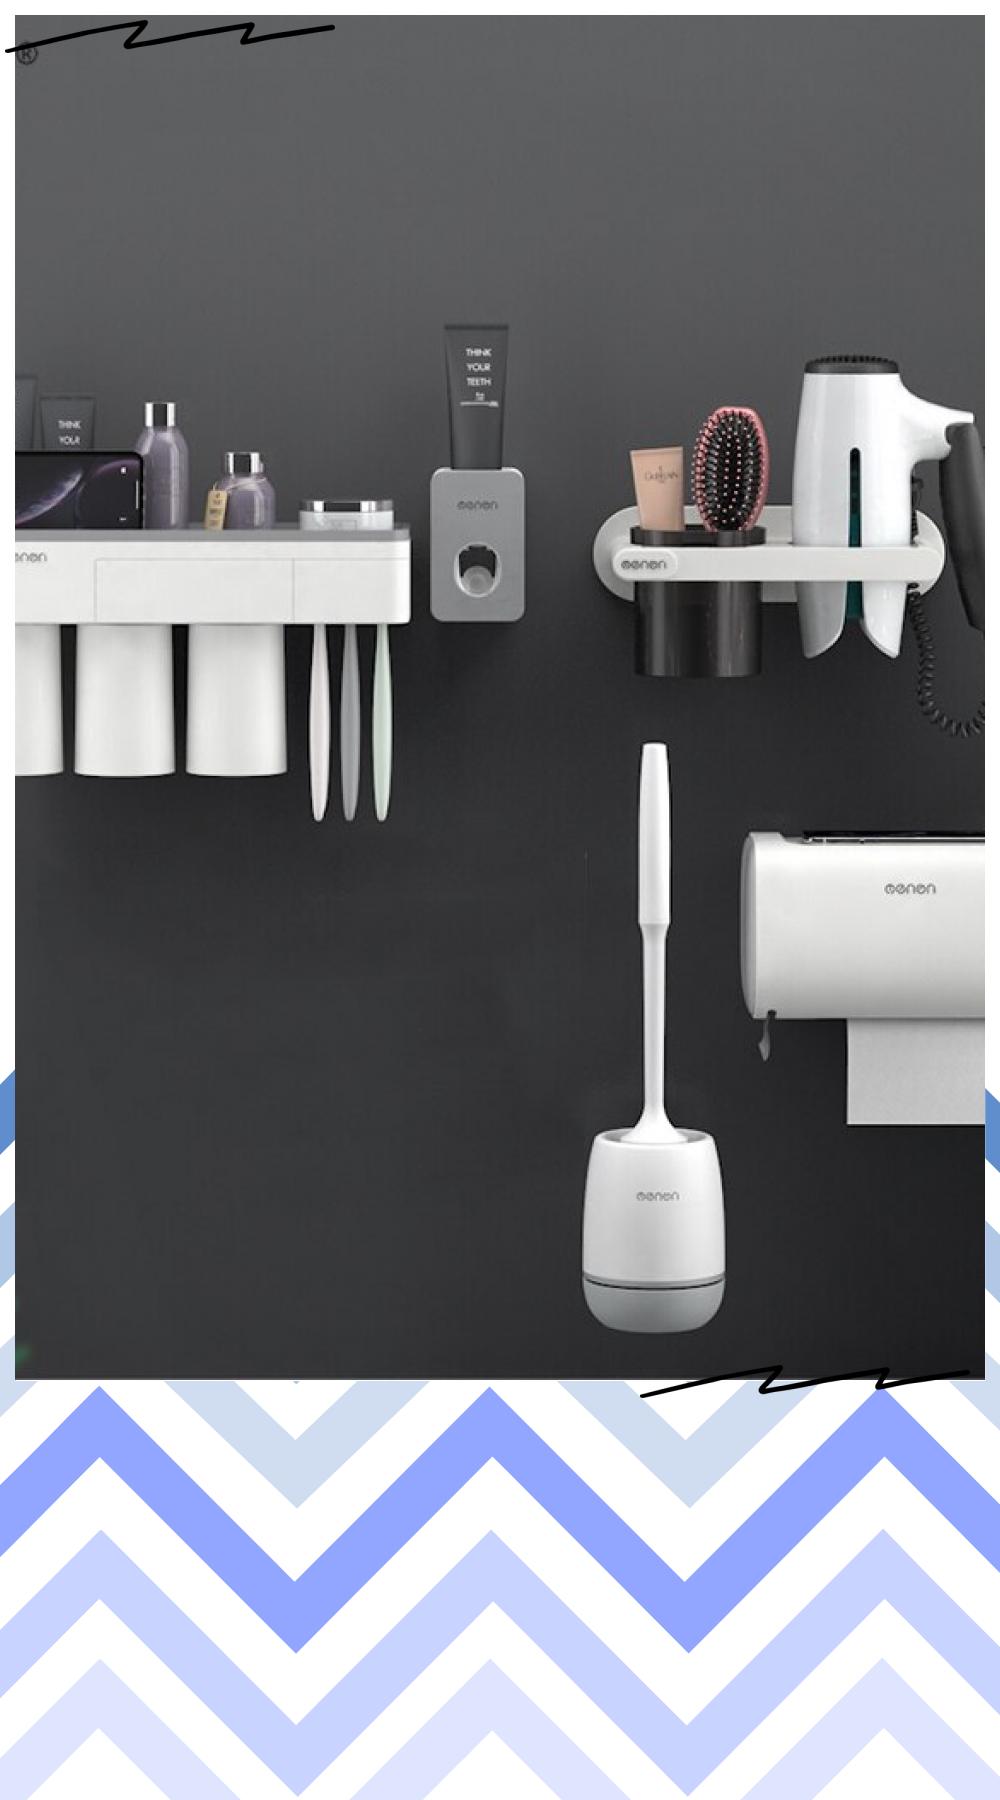 For Bathroom Accessories Set Multi Function Toothbrush Holder Toilet Brush Tissue Box Toothpaste In 2021 Bathroom Accessories Sets Bathroom Accessories Bathroom Decor